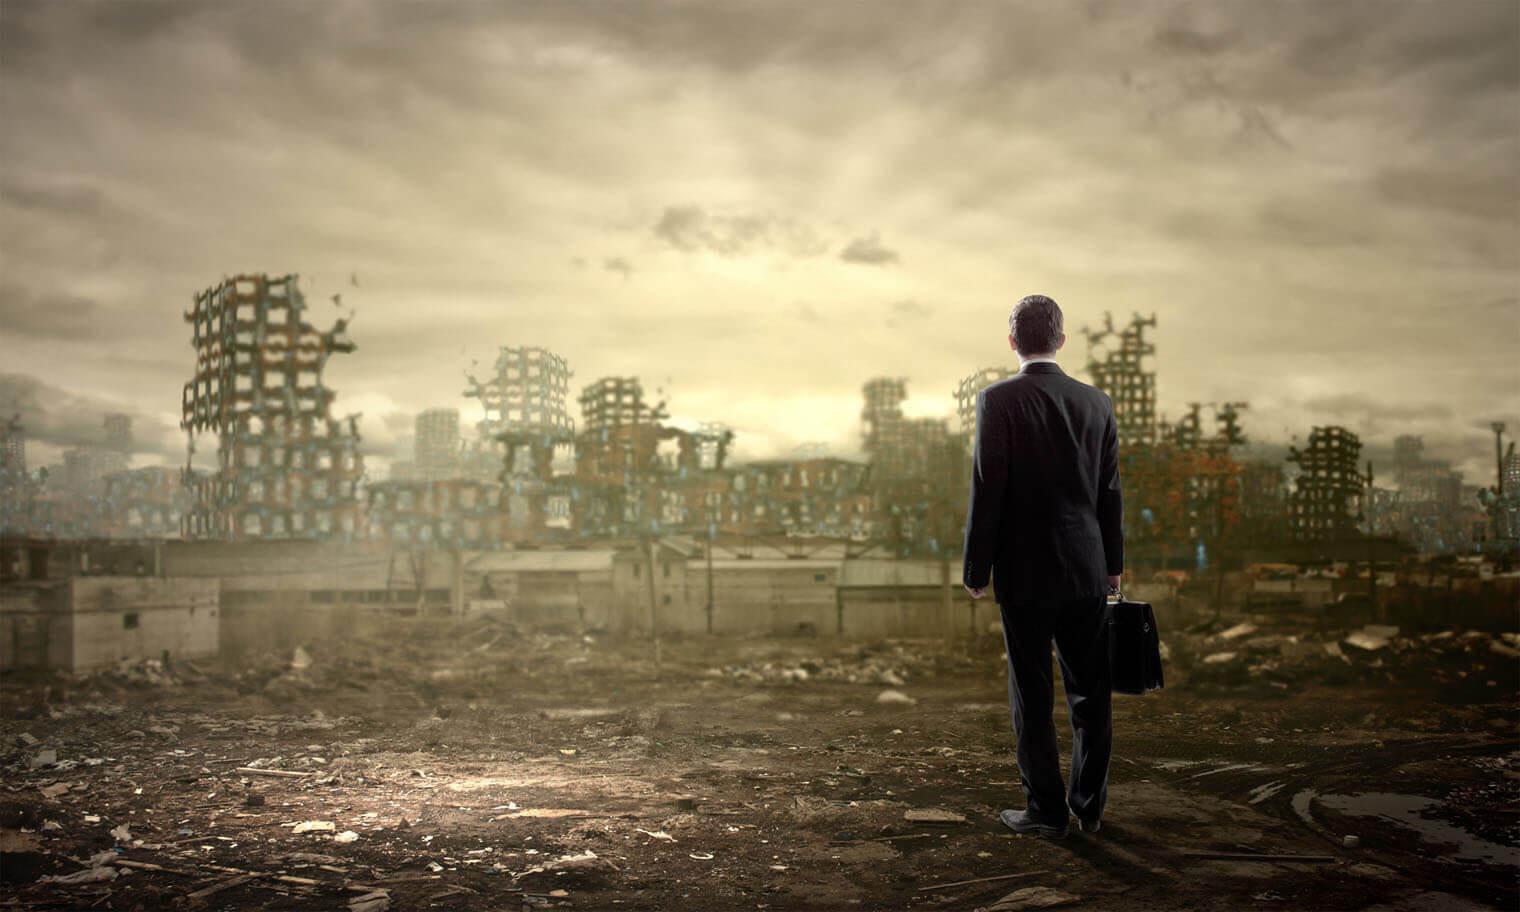 Man standing in ruins